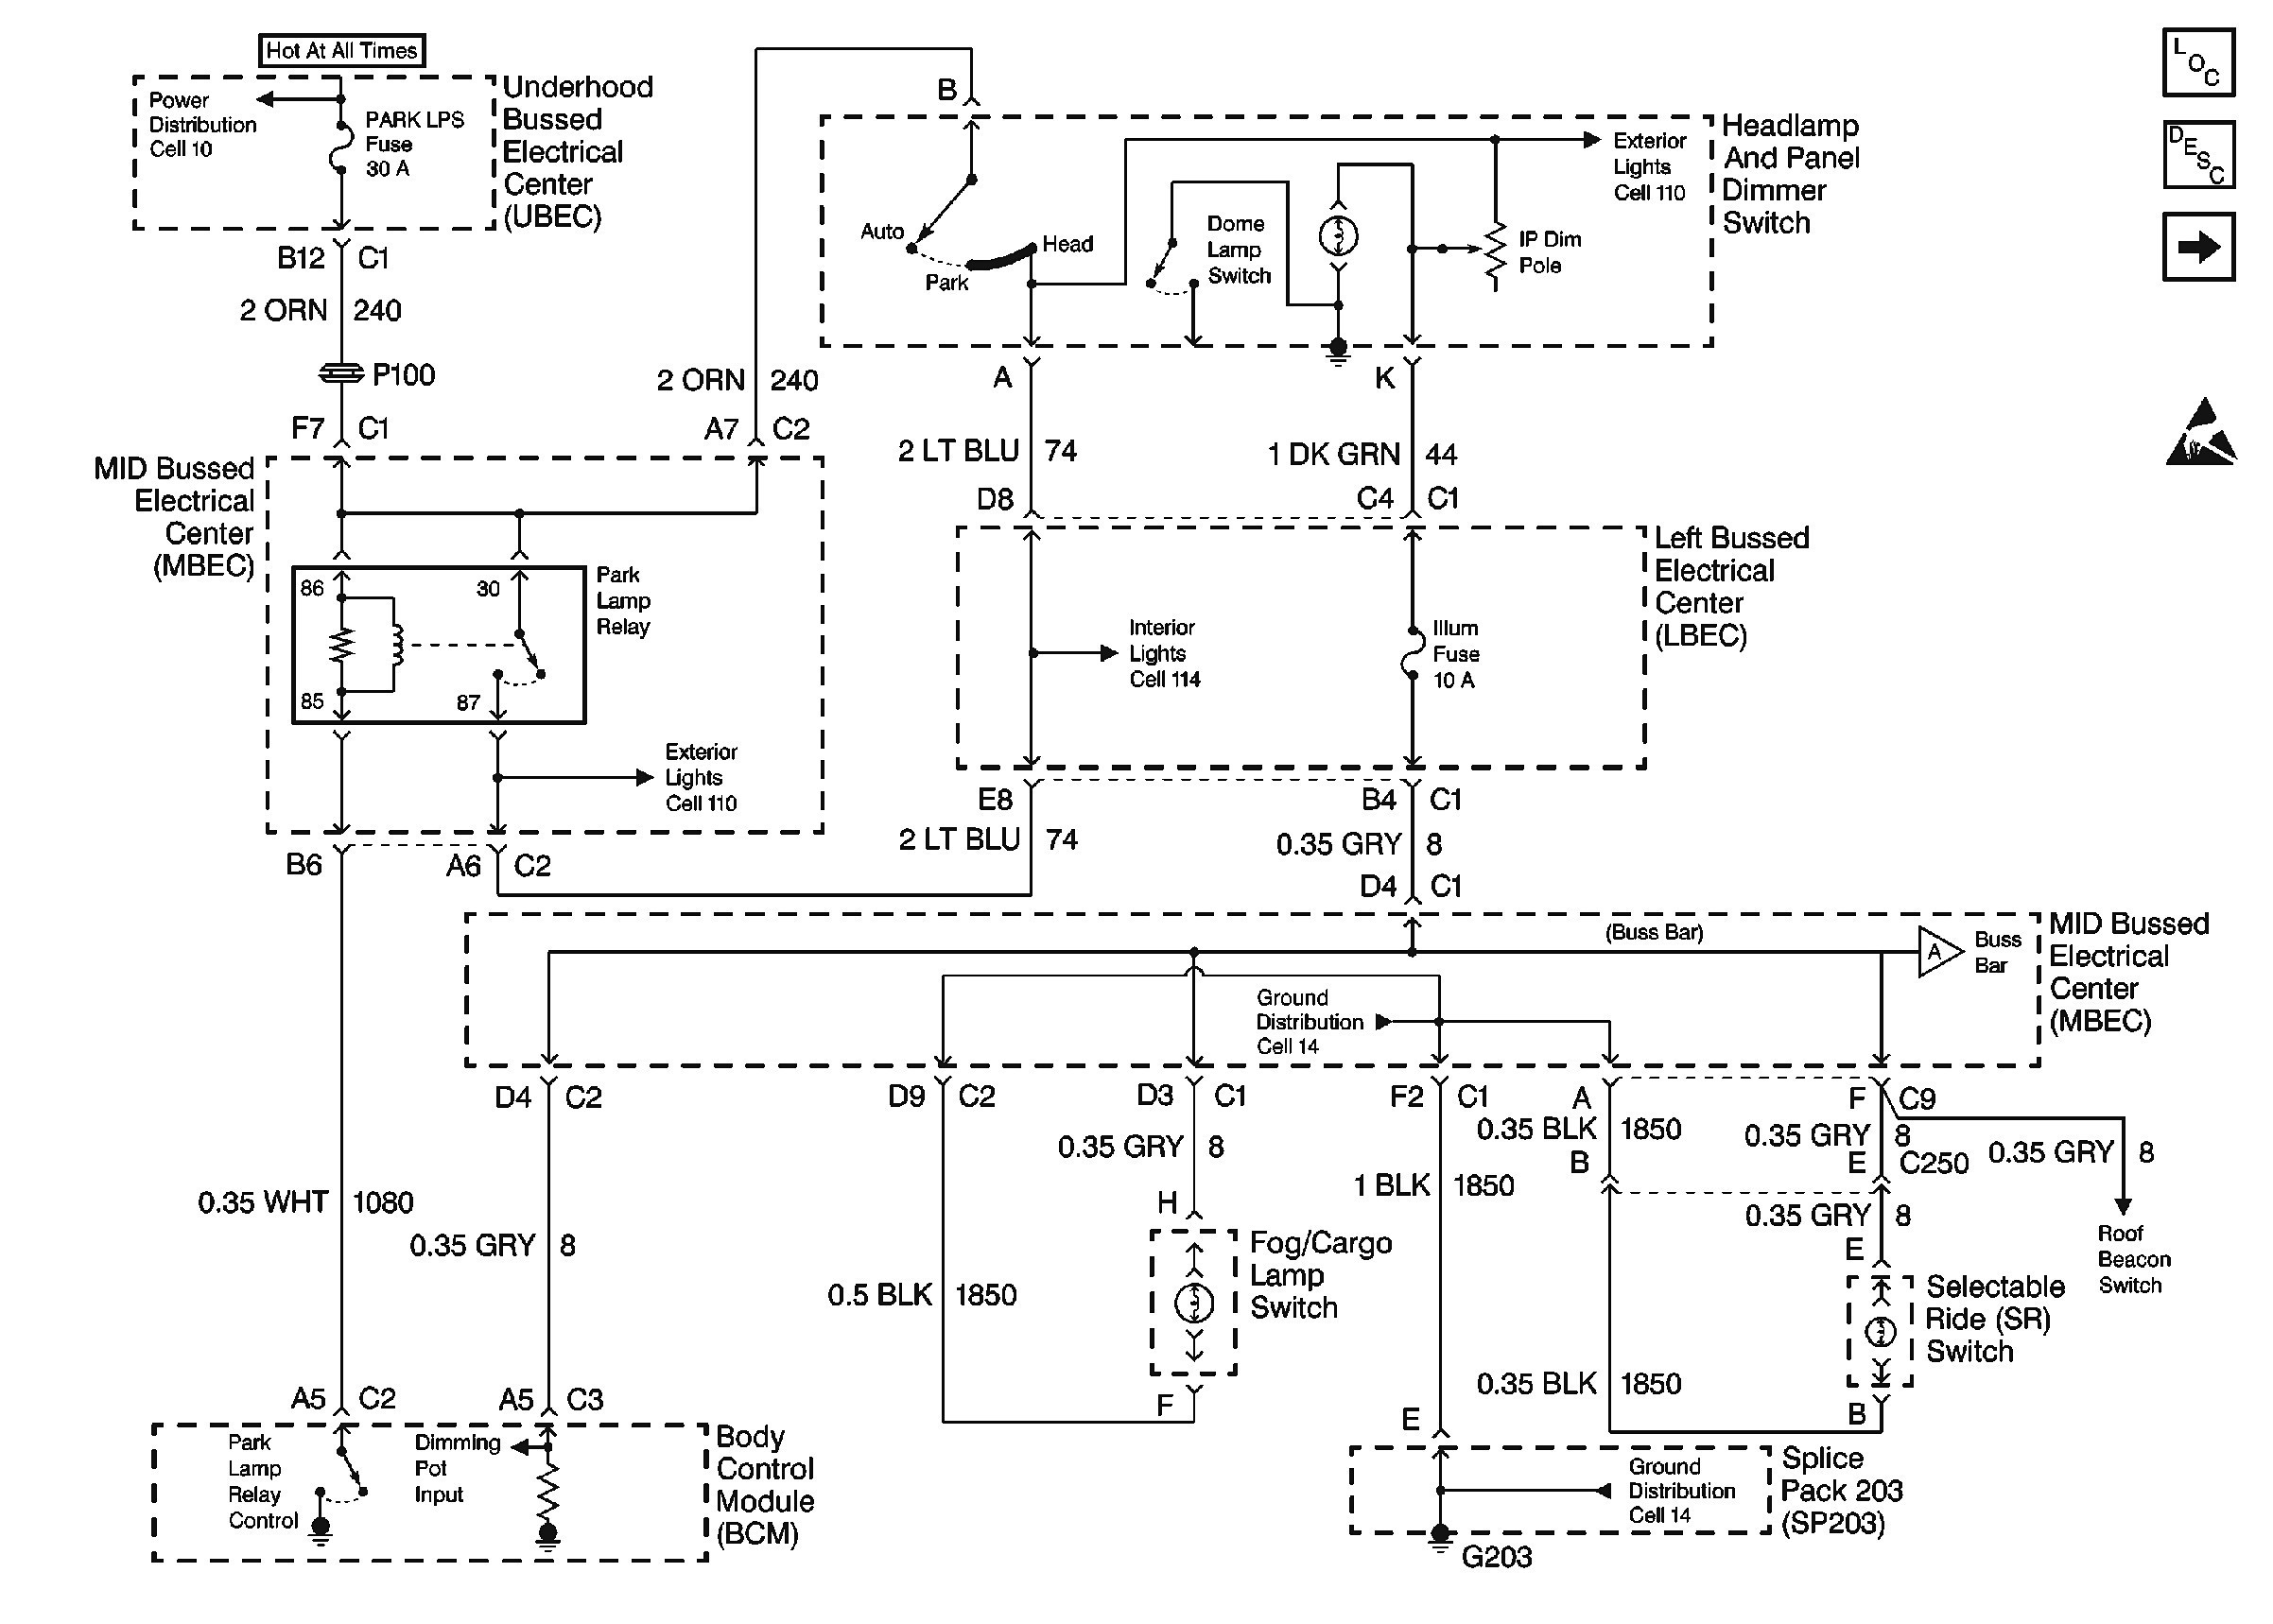 Malibu Outdoor Lighting Diagram Trusted Wiring External Diagrams Exterior 2003 Electrical Work Silverado